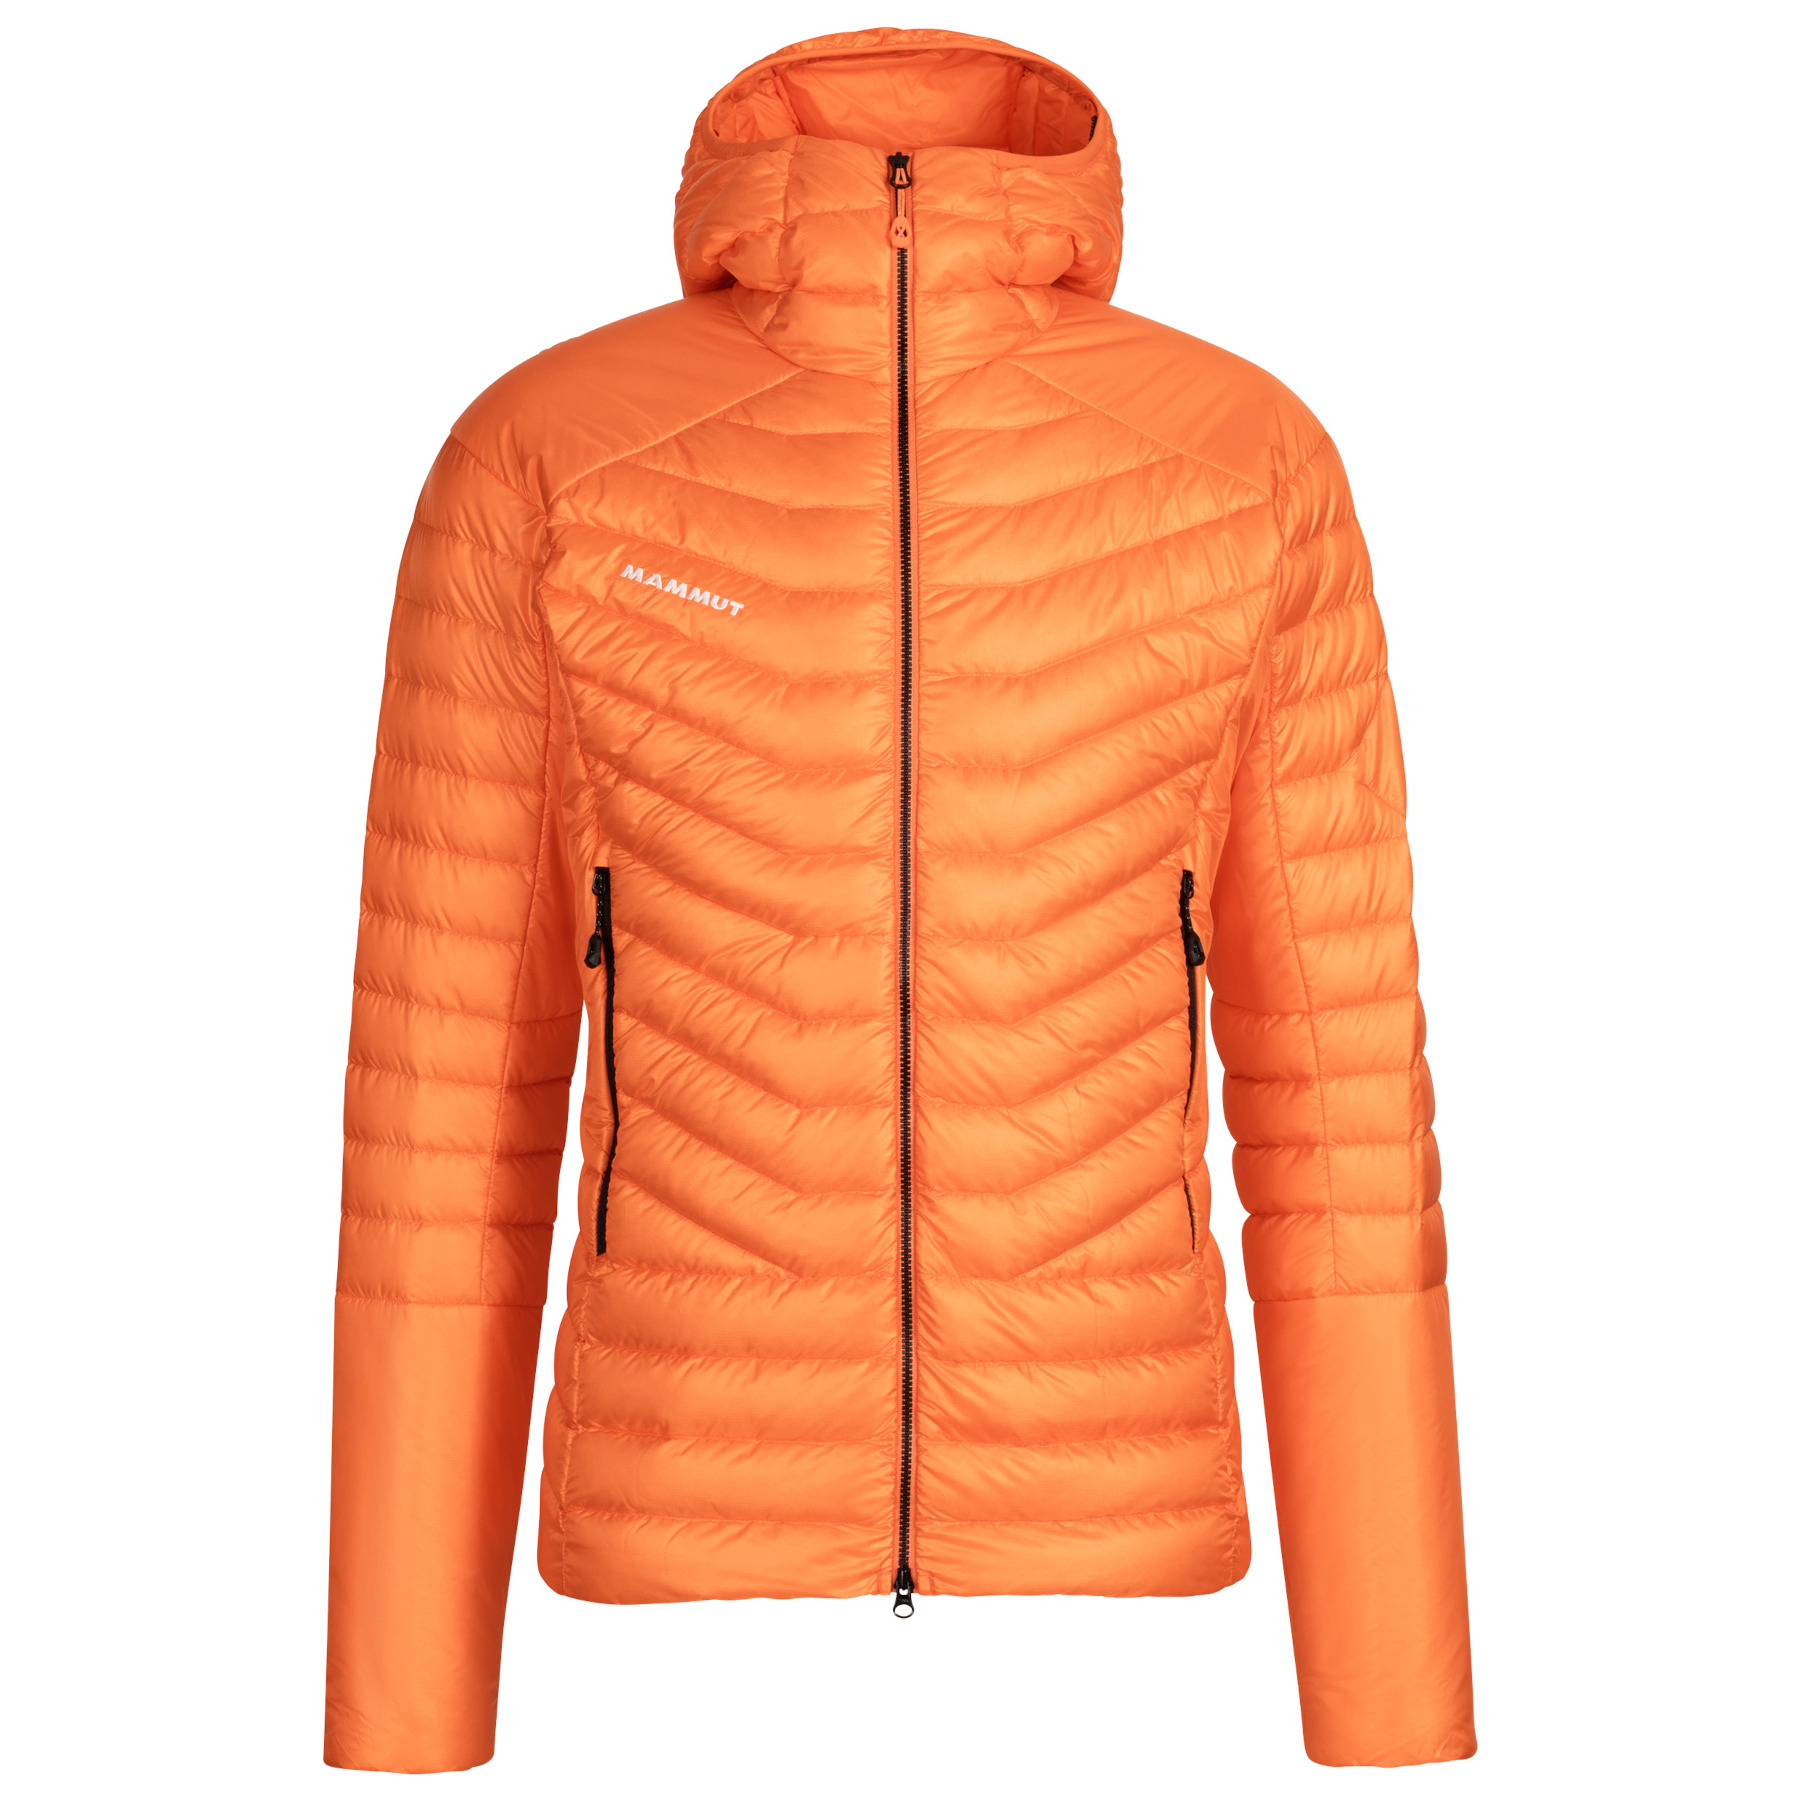 Mammut Eigerjoch Advanced Insulated Hooded Jacket Men - arumita